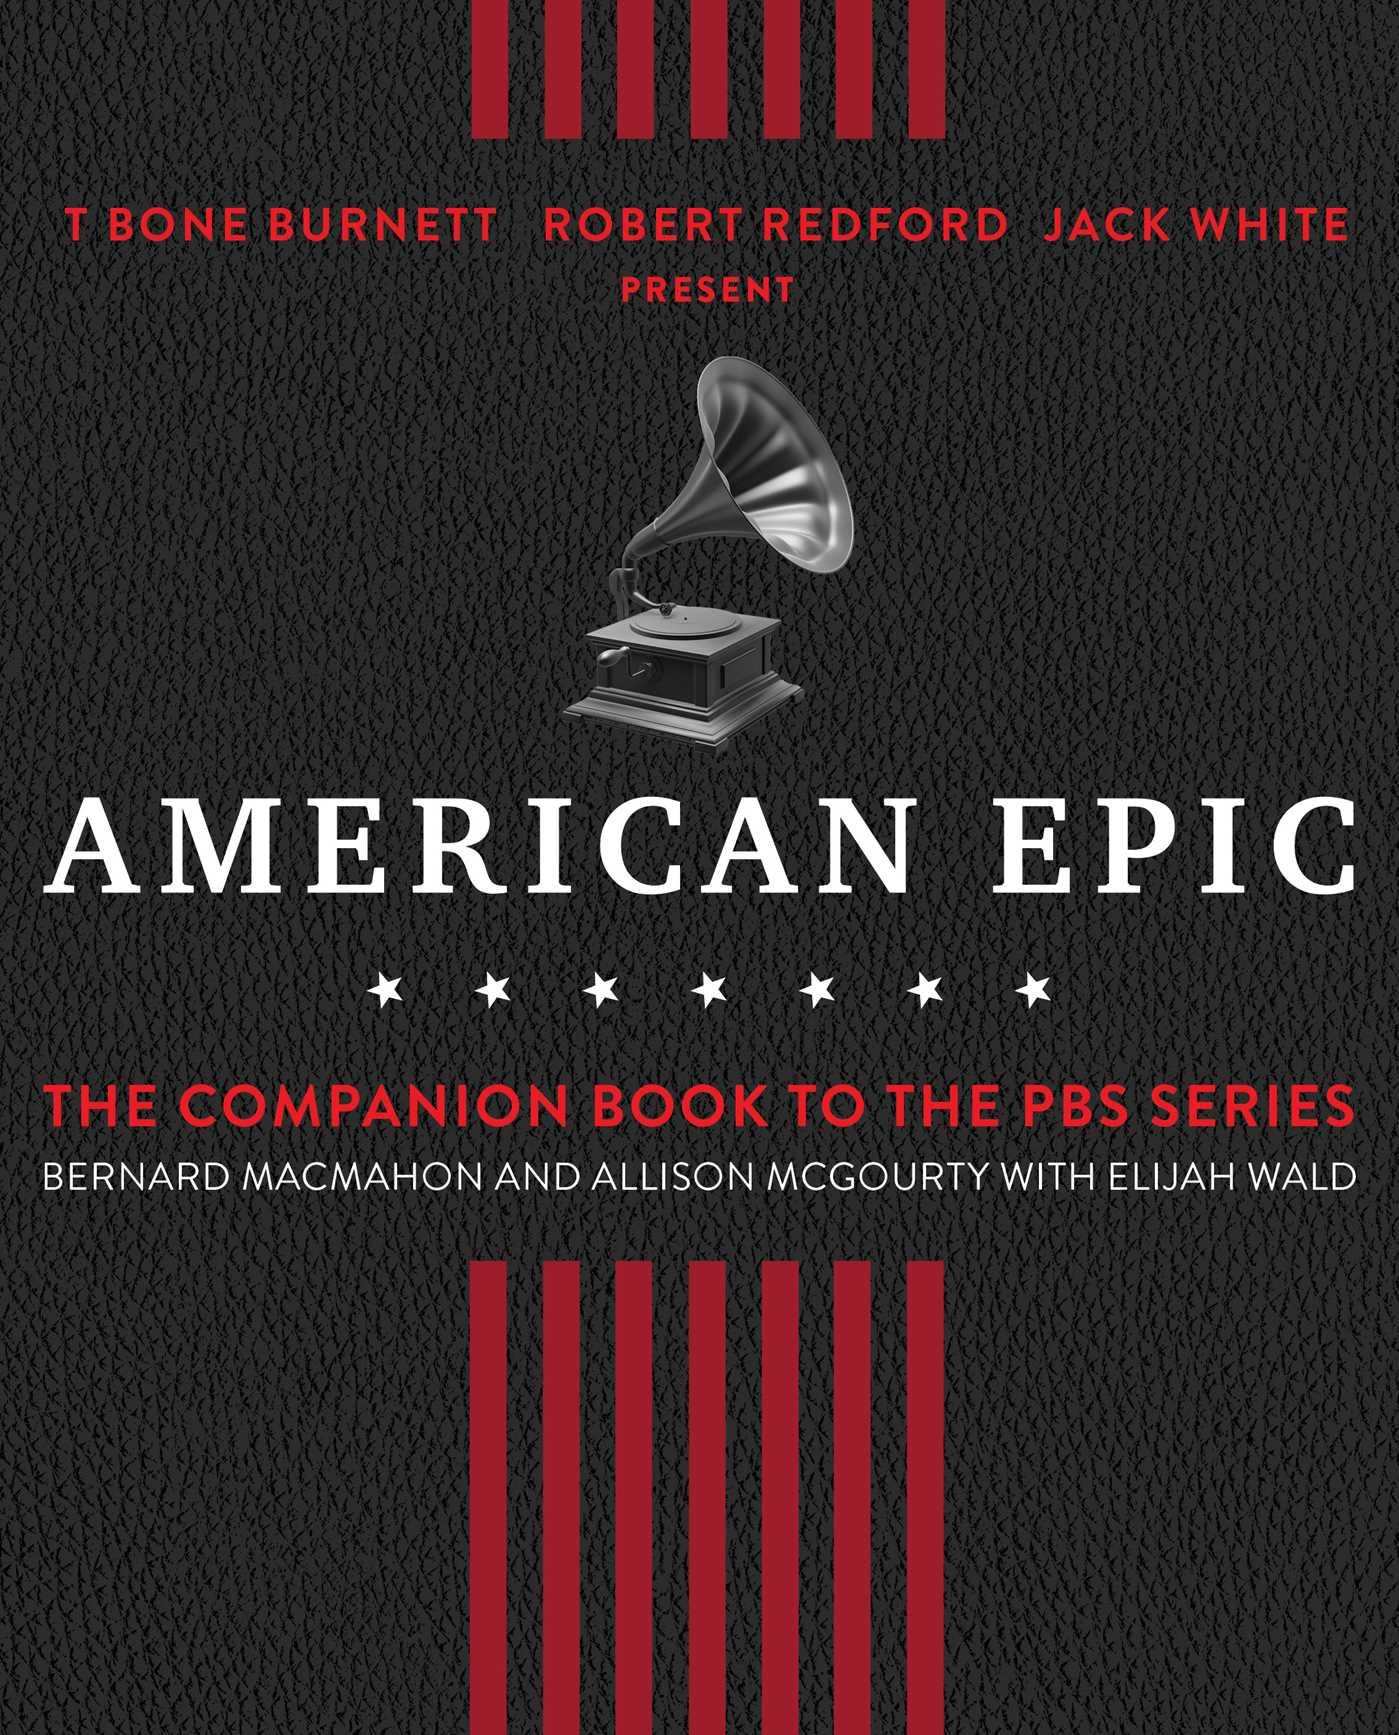 American epic 9781501135606 hr